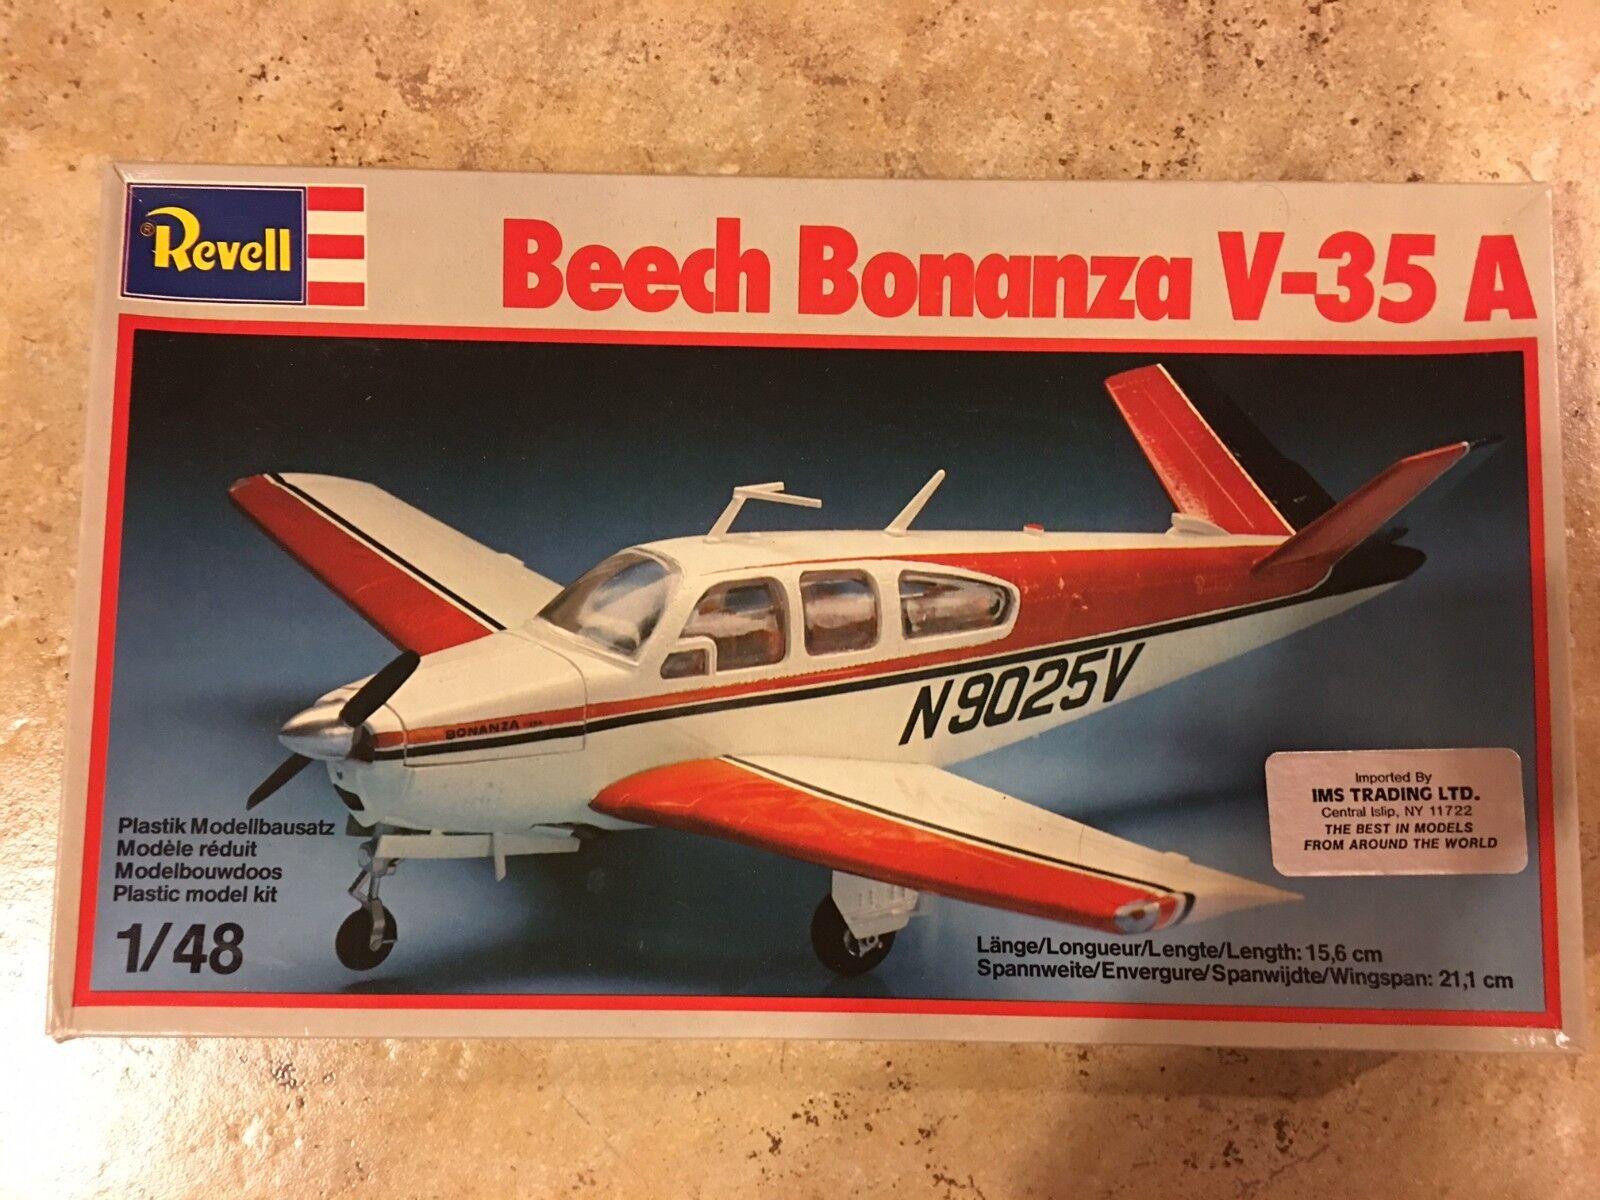 REVELL BEECH BONANZA V-35 A 1 48 SCALE MODEL PLANE OPEN BOX PARTS SEALED INSIDE